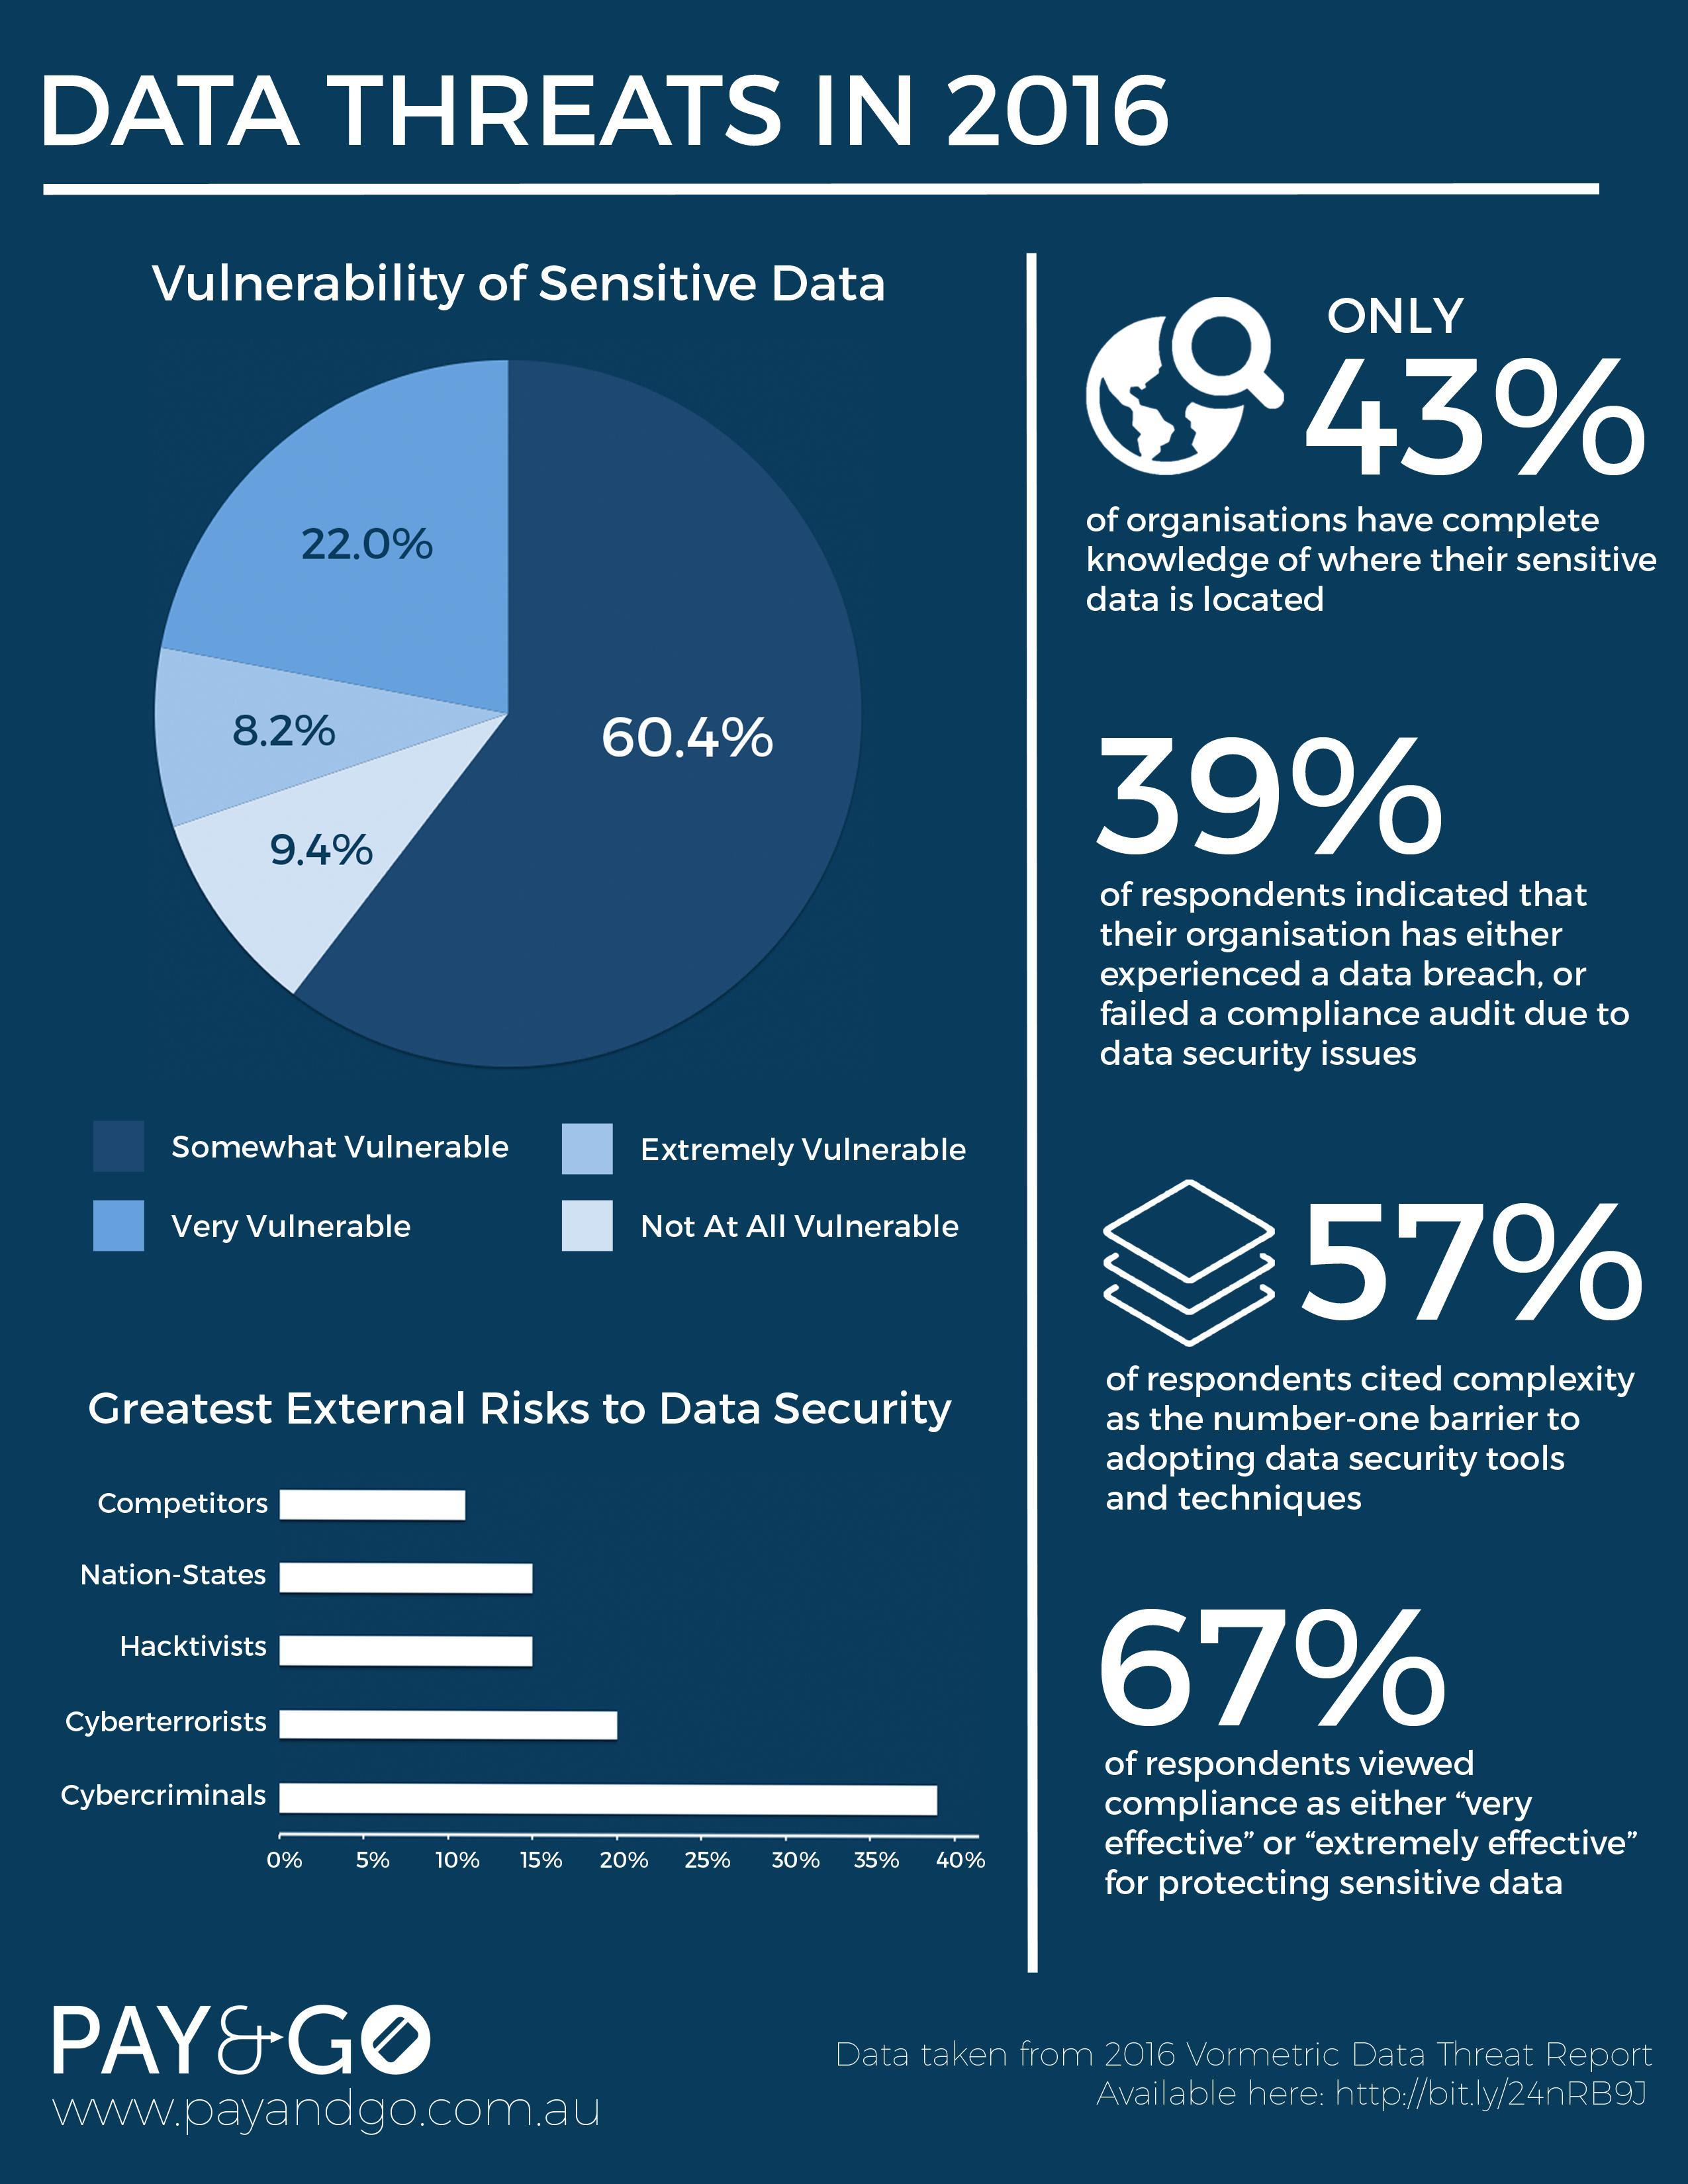 A Summary of Data Threats in 2016